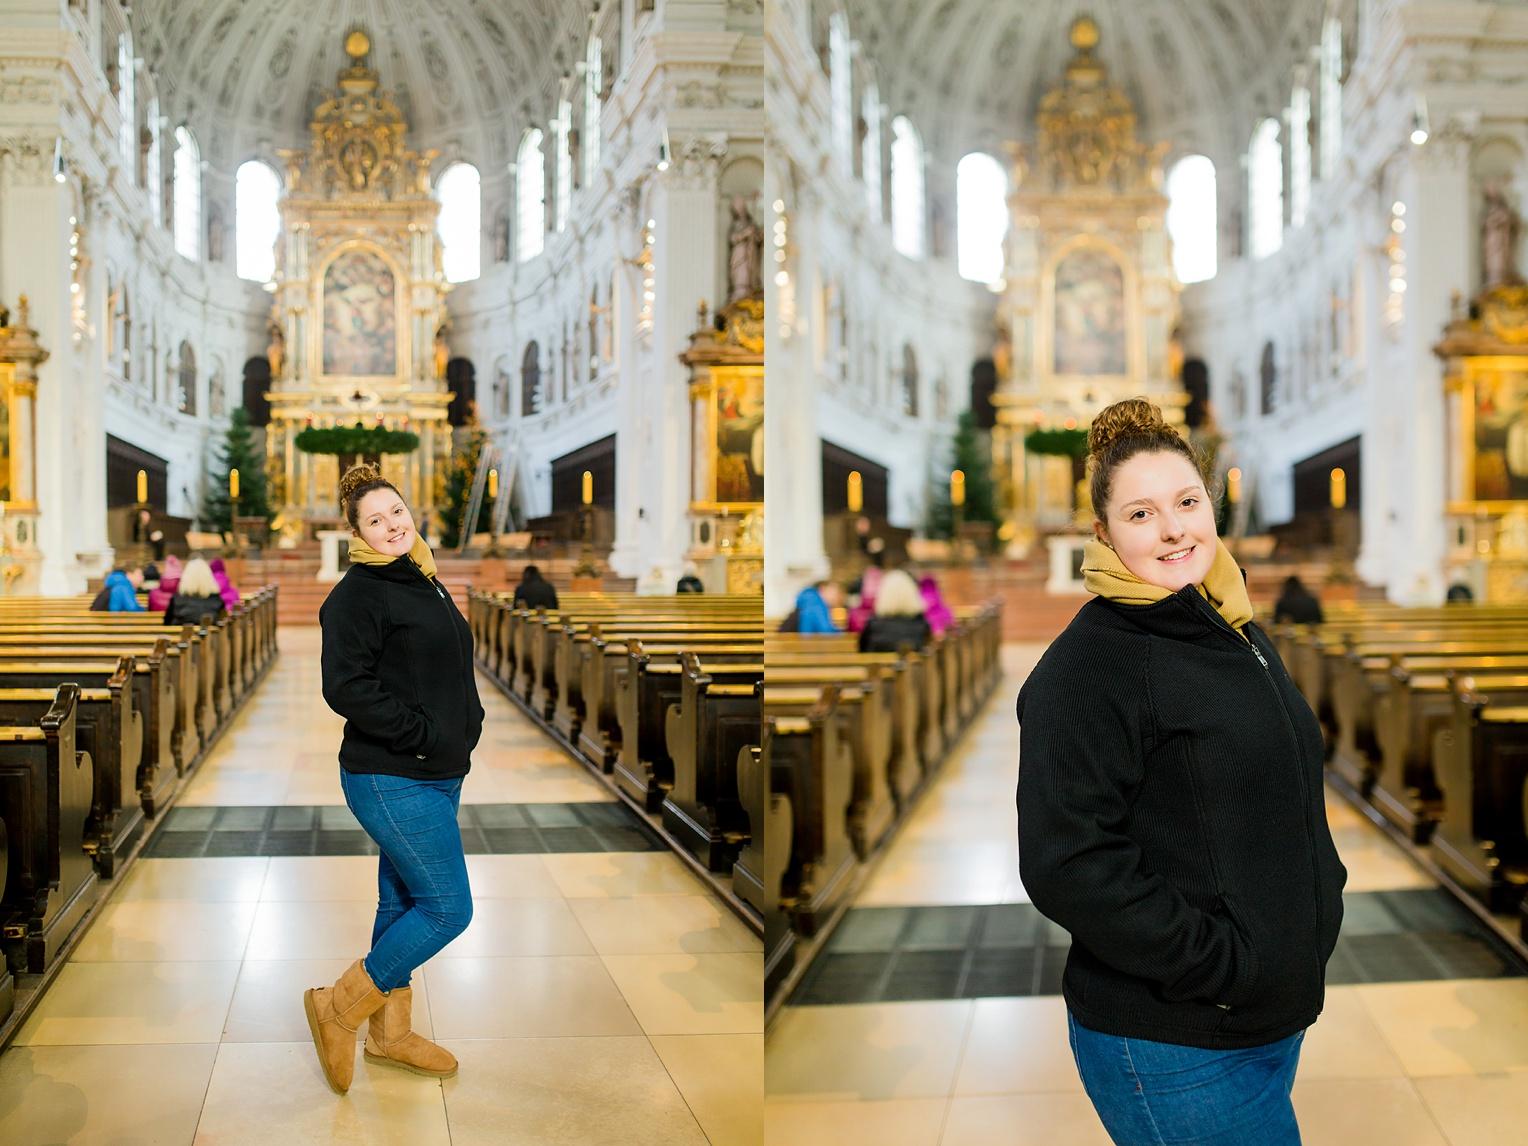 Christmas in Europe Part I: Munich, Berchtesgaden, and Salzburg